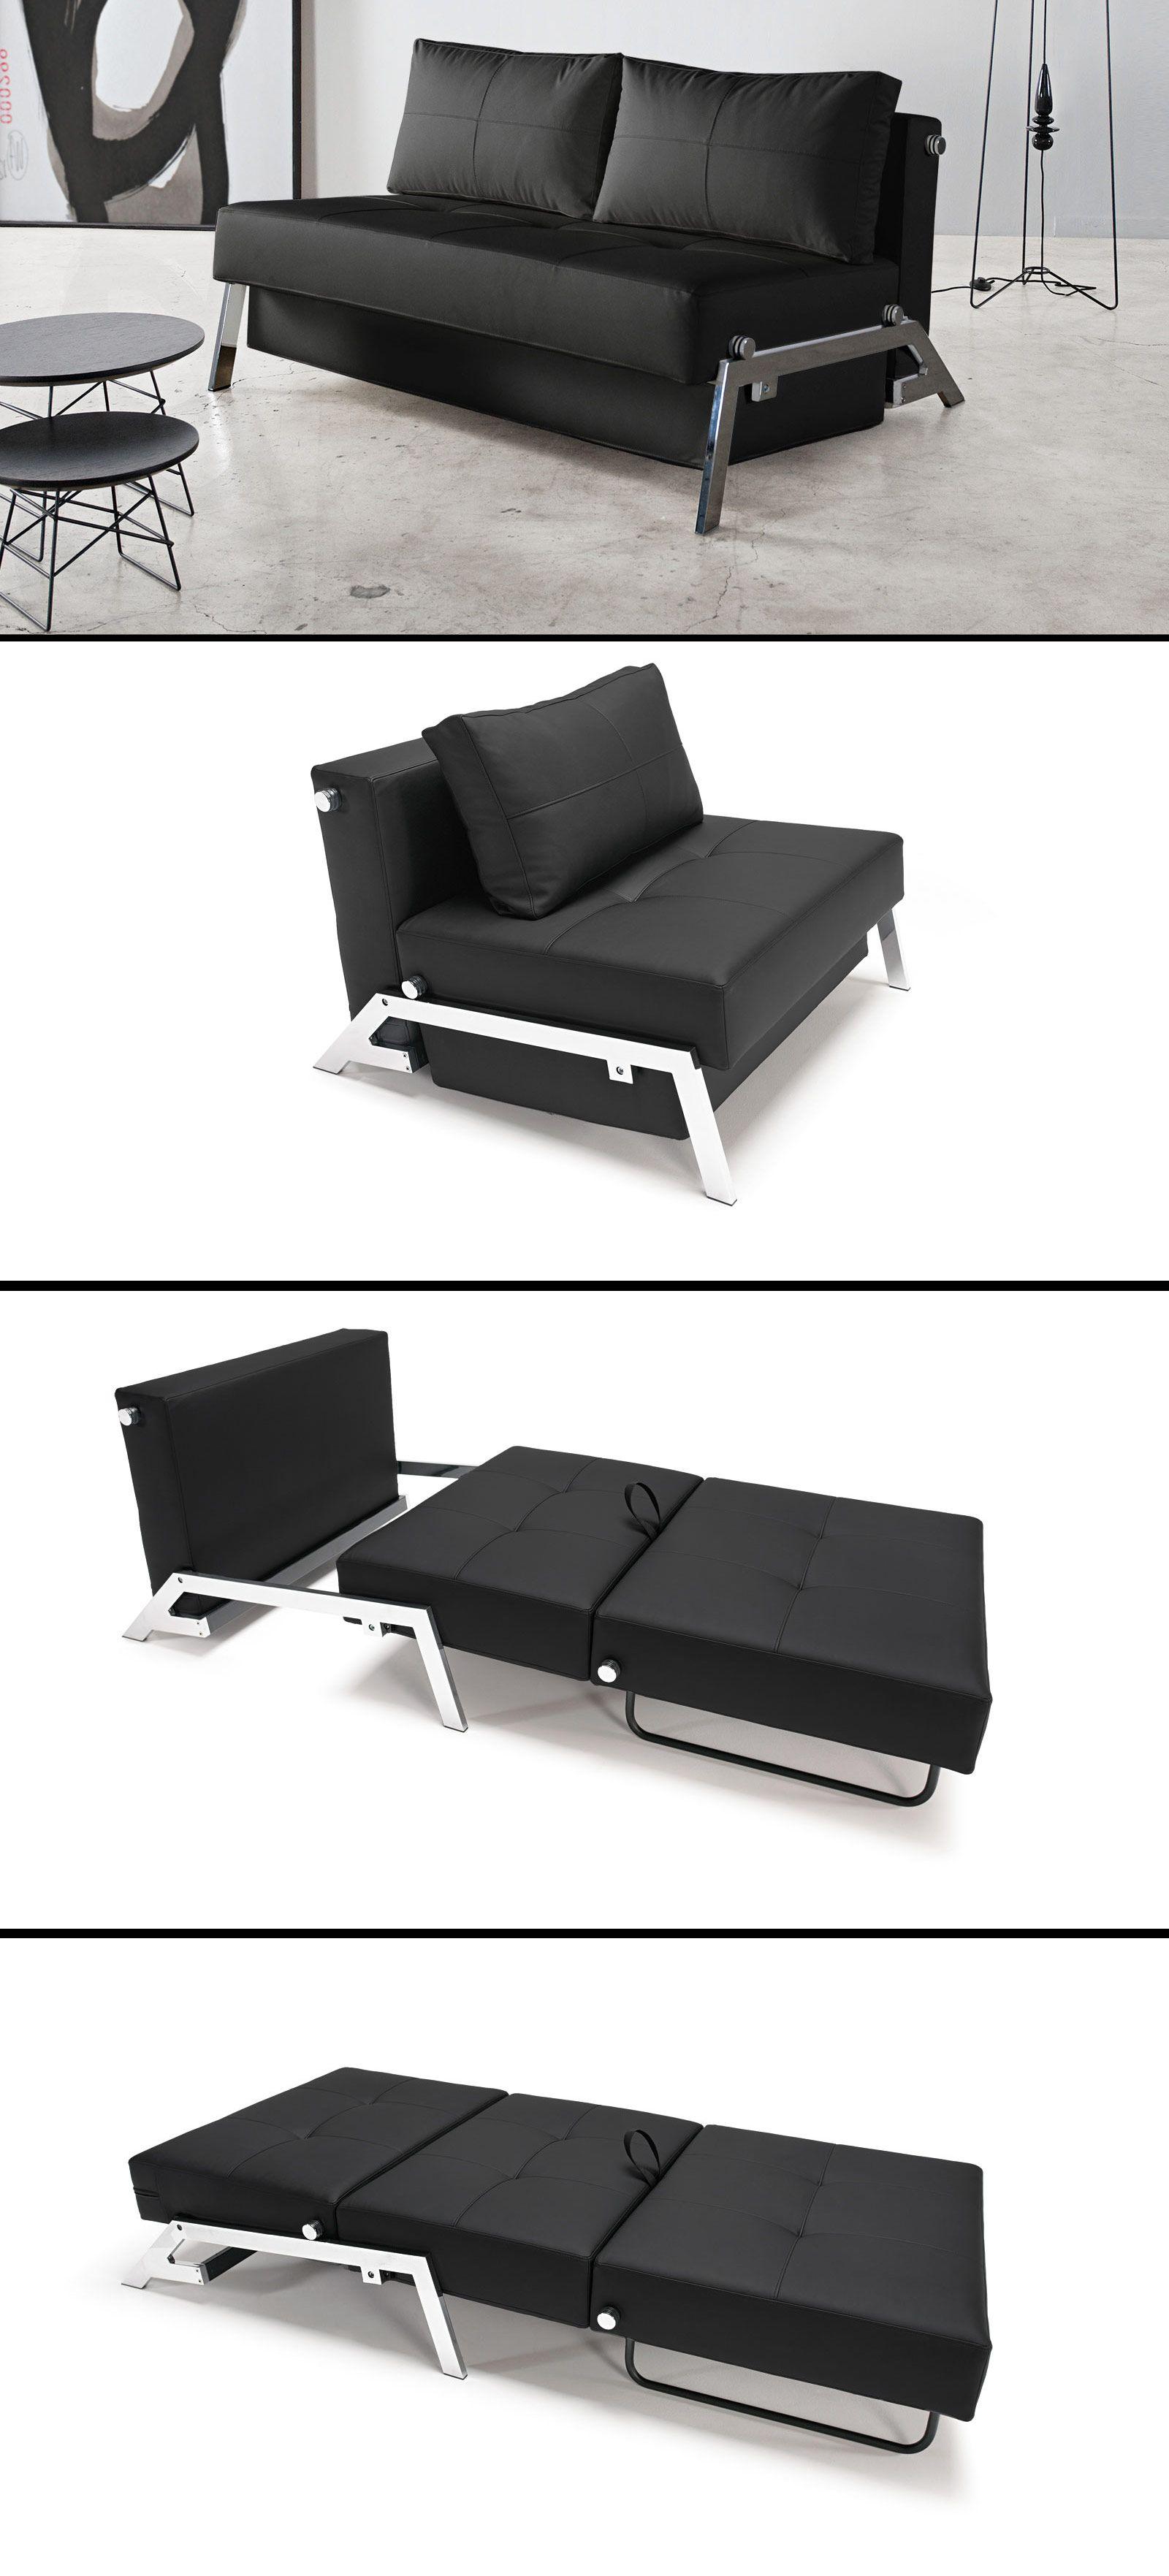 schlafsofa dowing modern living and modern. Black Bedroom Furniture Sets. Home Design Ideas